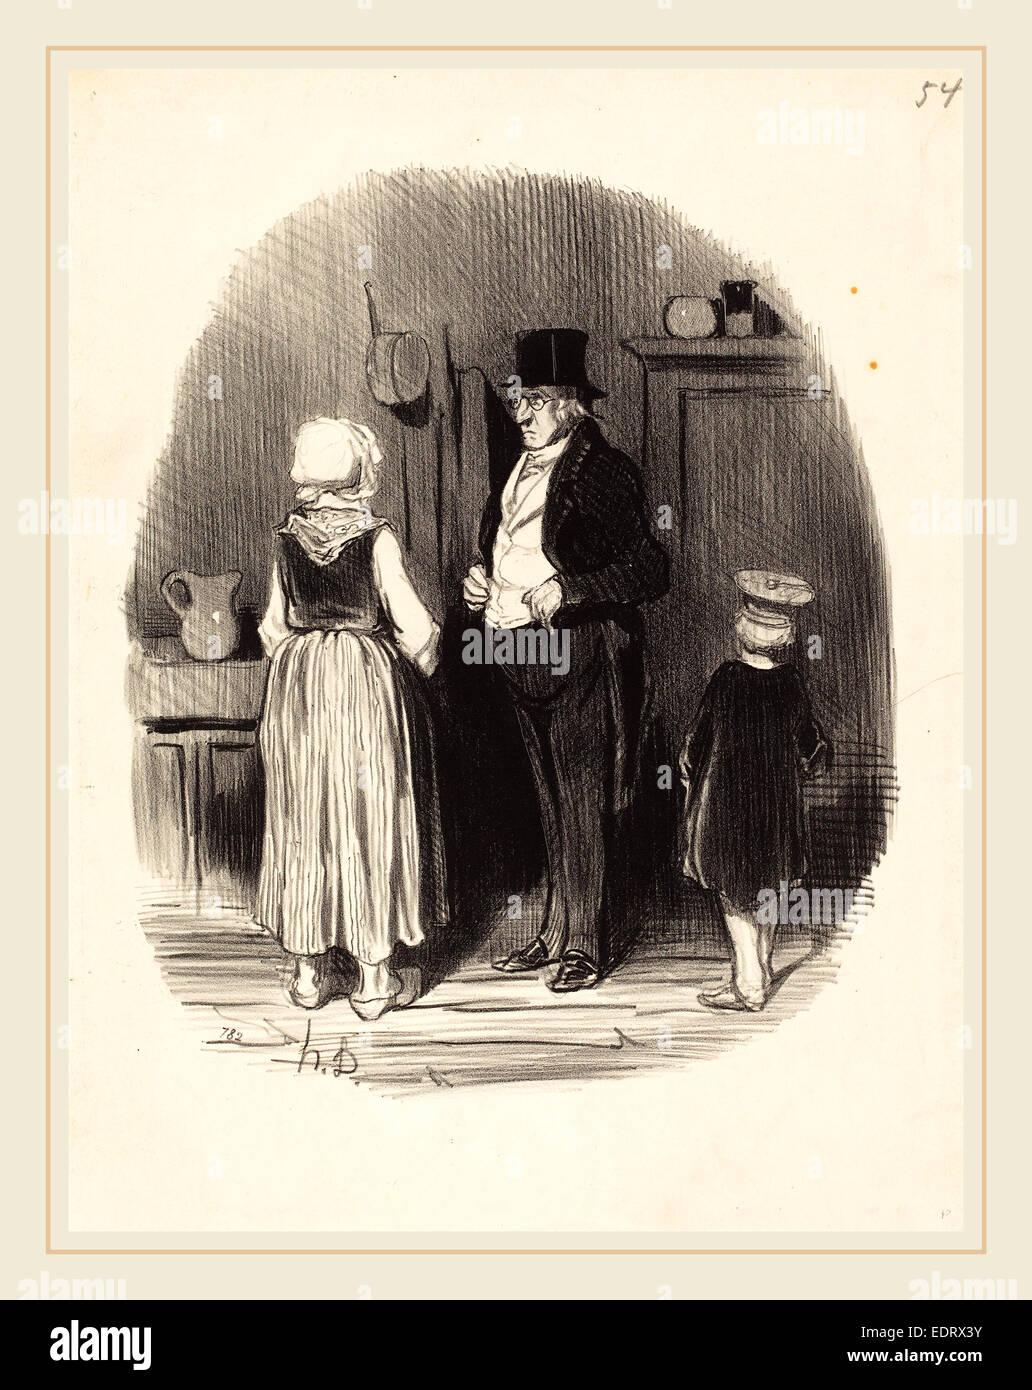 Honoré Daumier (French, 1808-1879), Comment! tous mes moutons sont morts, 1845, lithograph - Stock Image